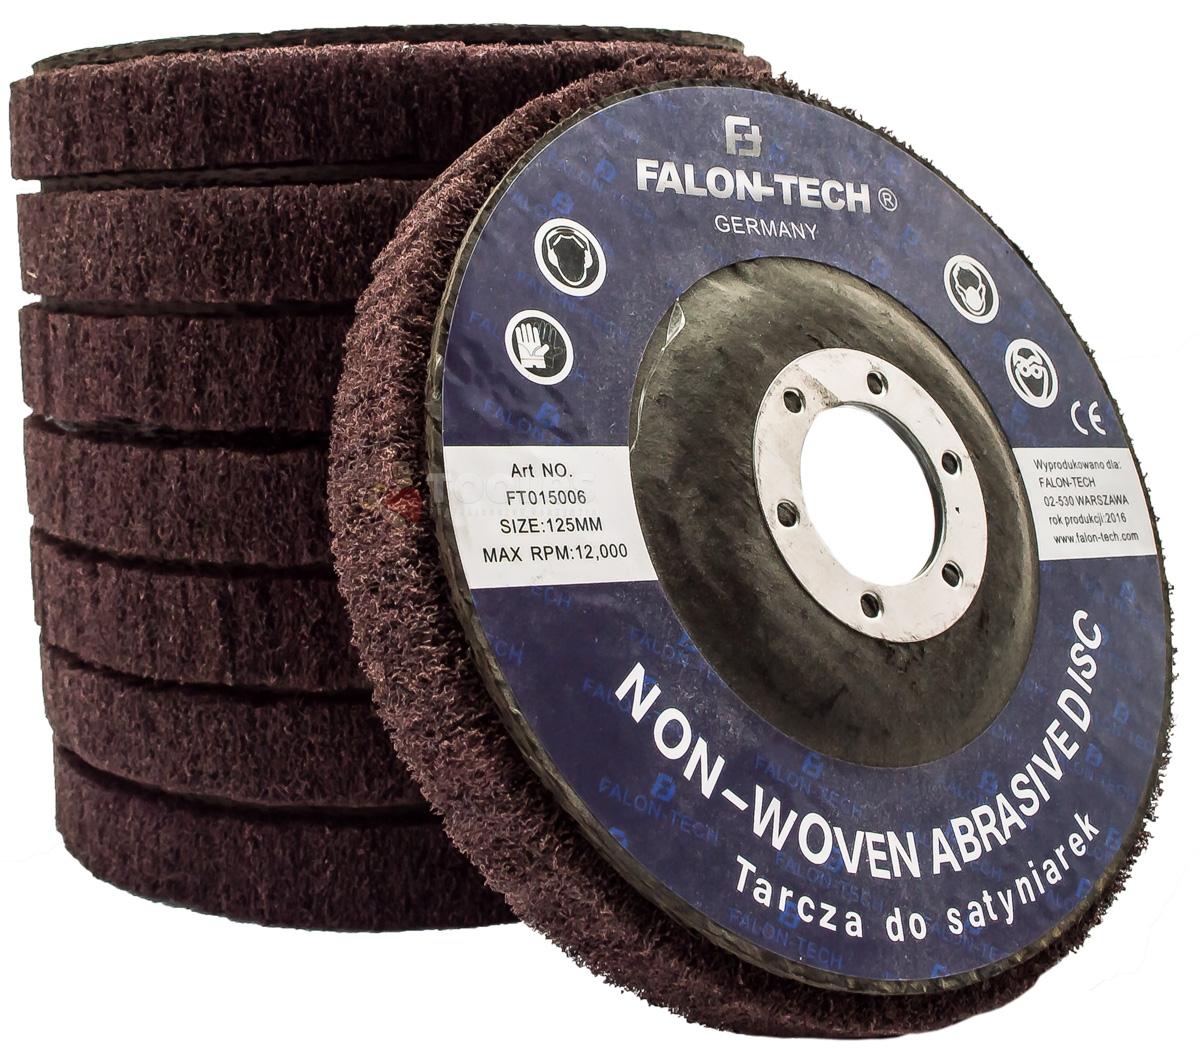 Image of Tarcza do metalu włóknina ściernica 125mm satyniarek falon